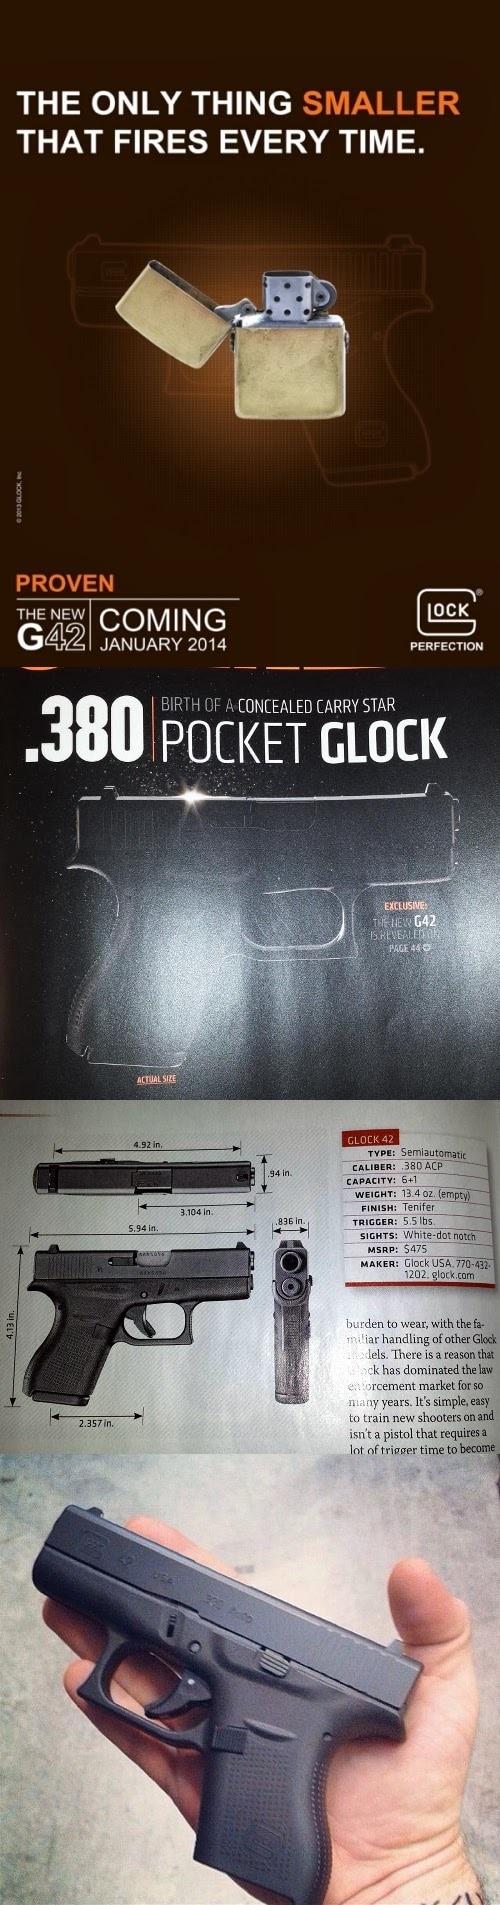 glock 42 rumors